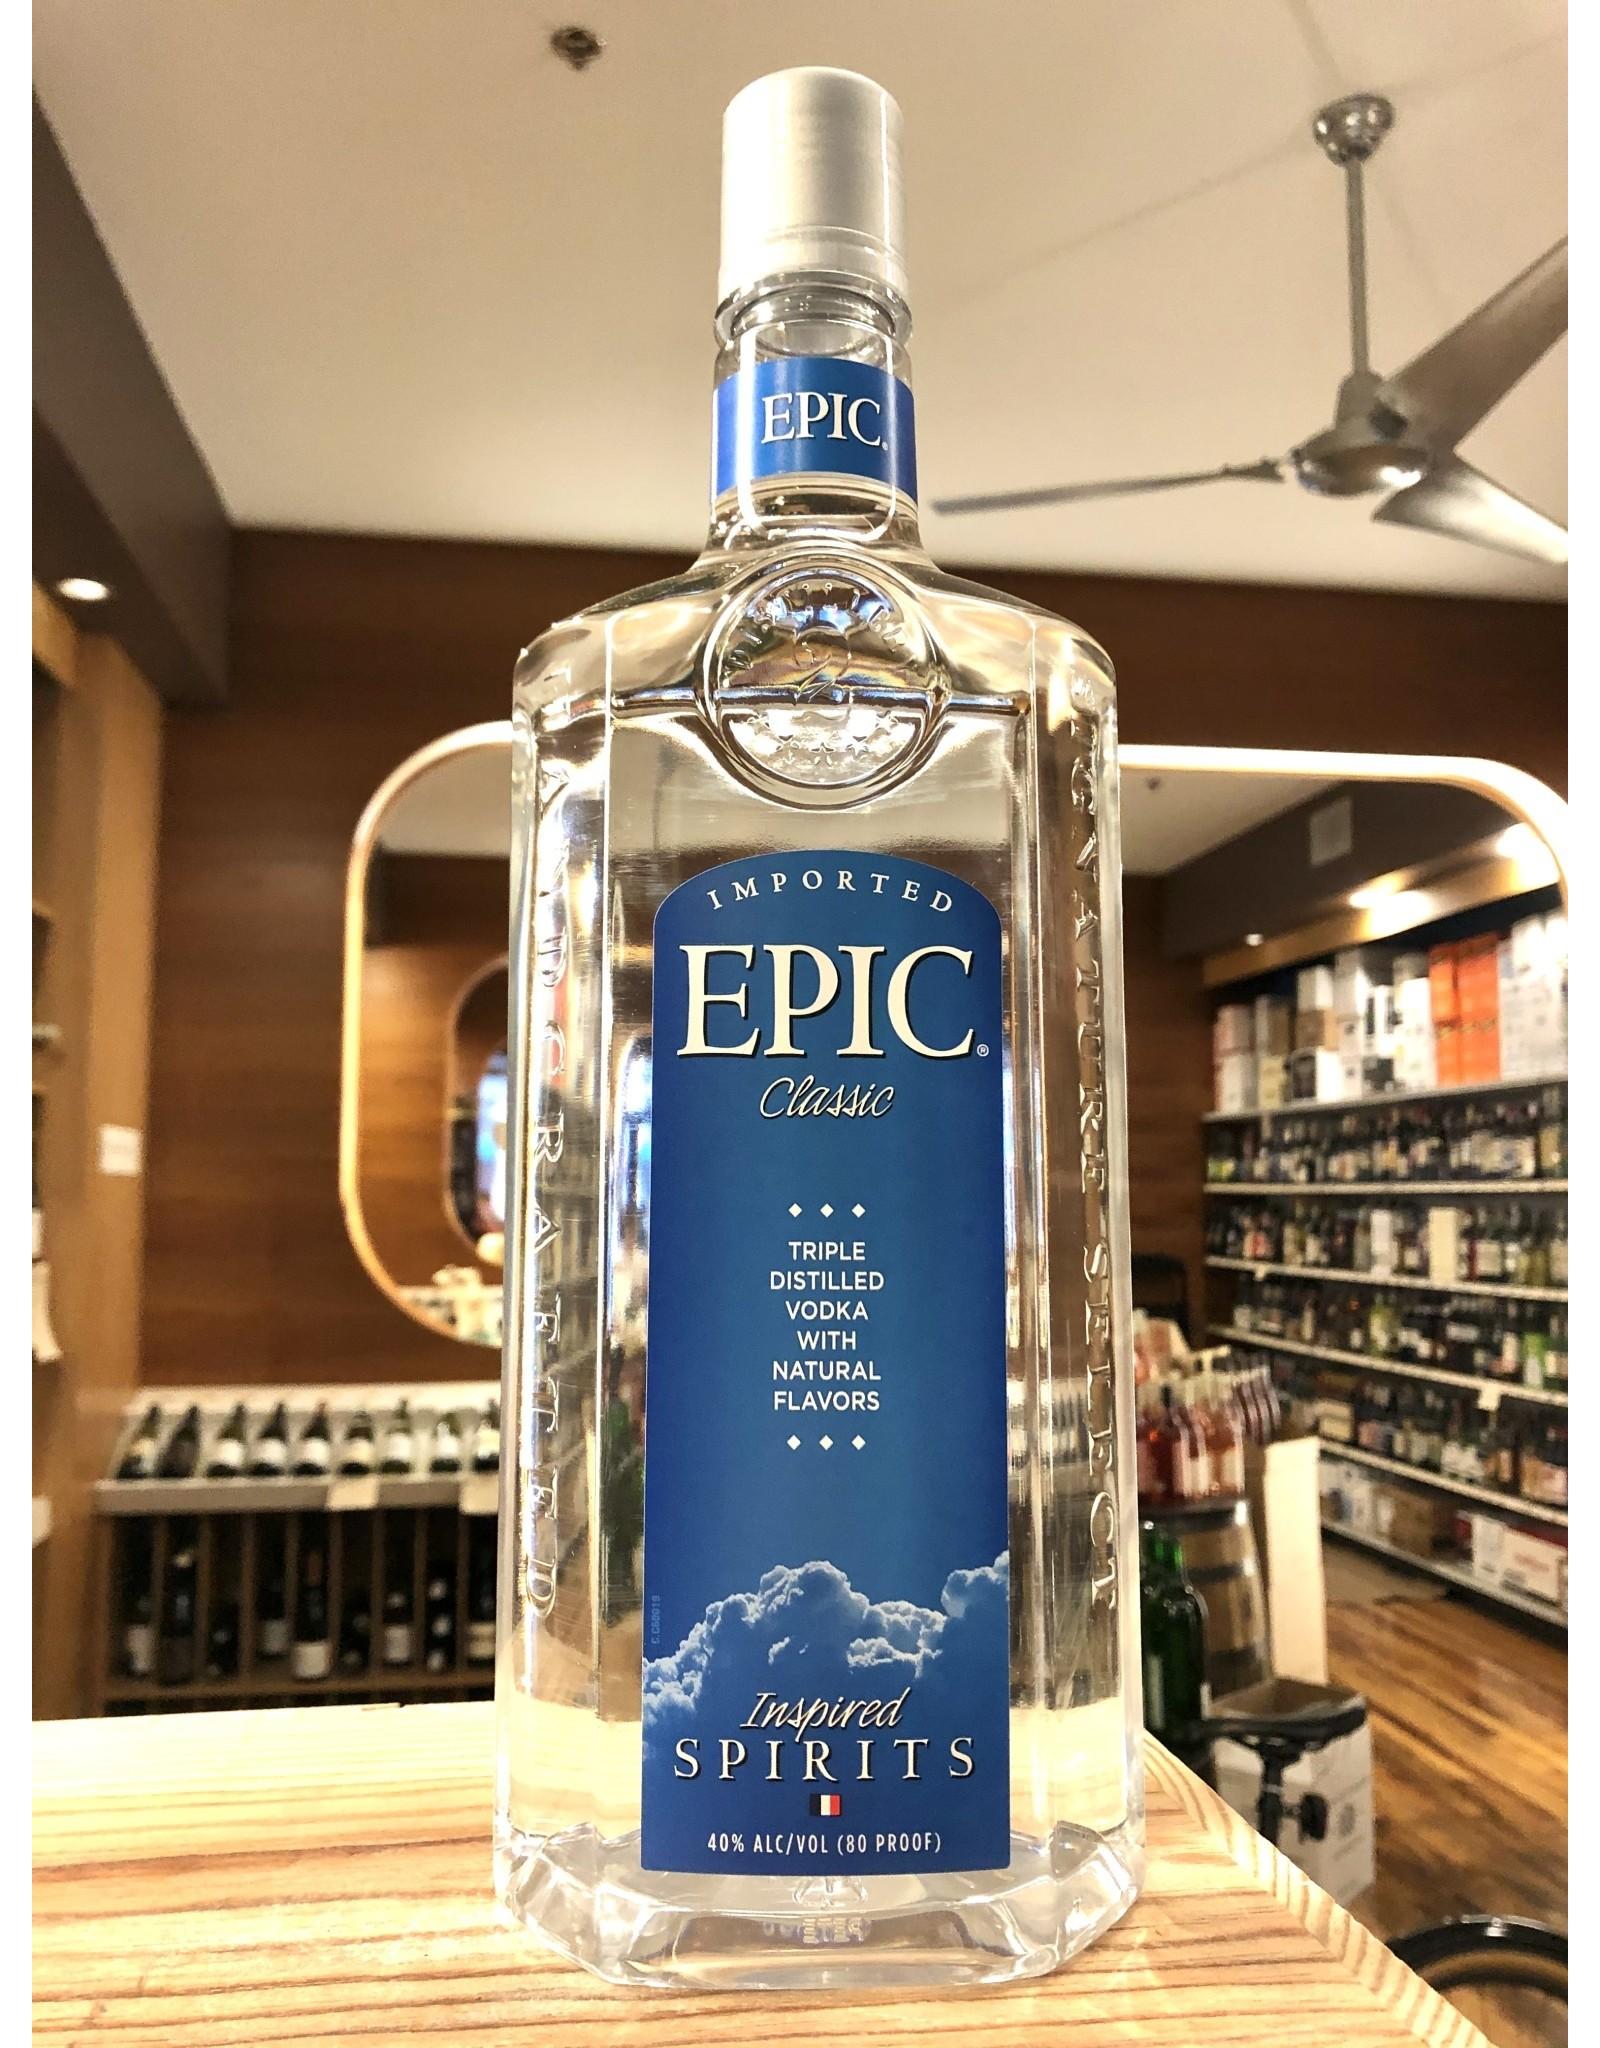 Epic Vodka  - 1.75 Liter